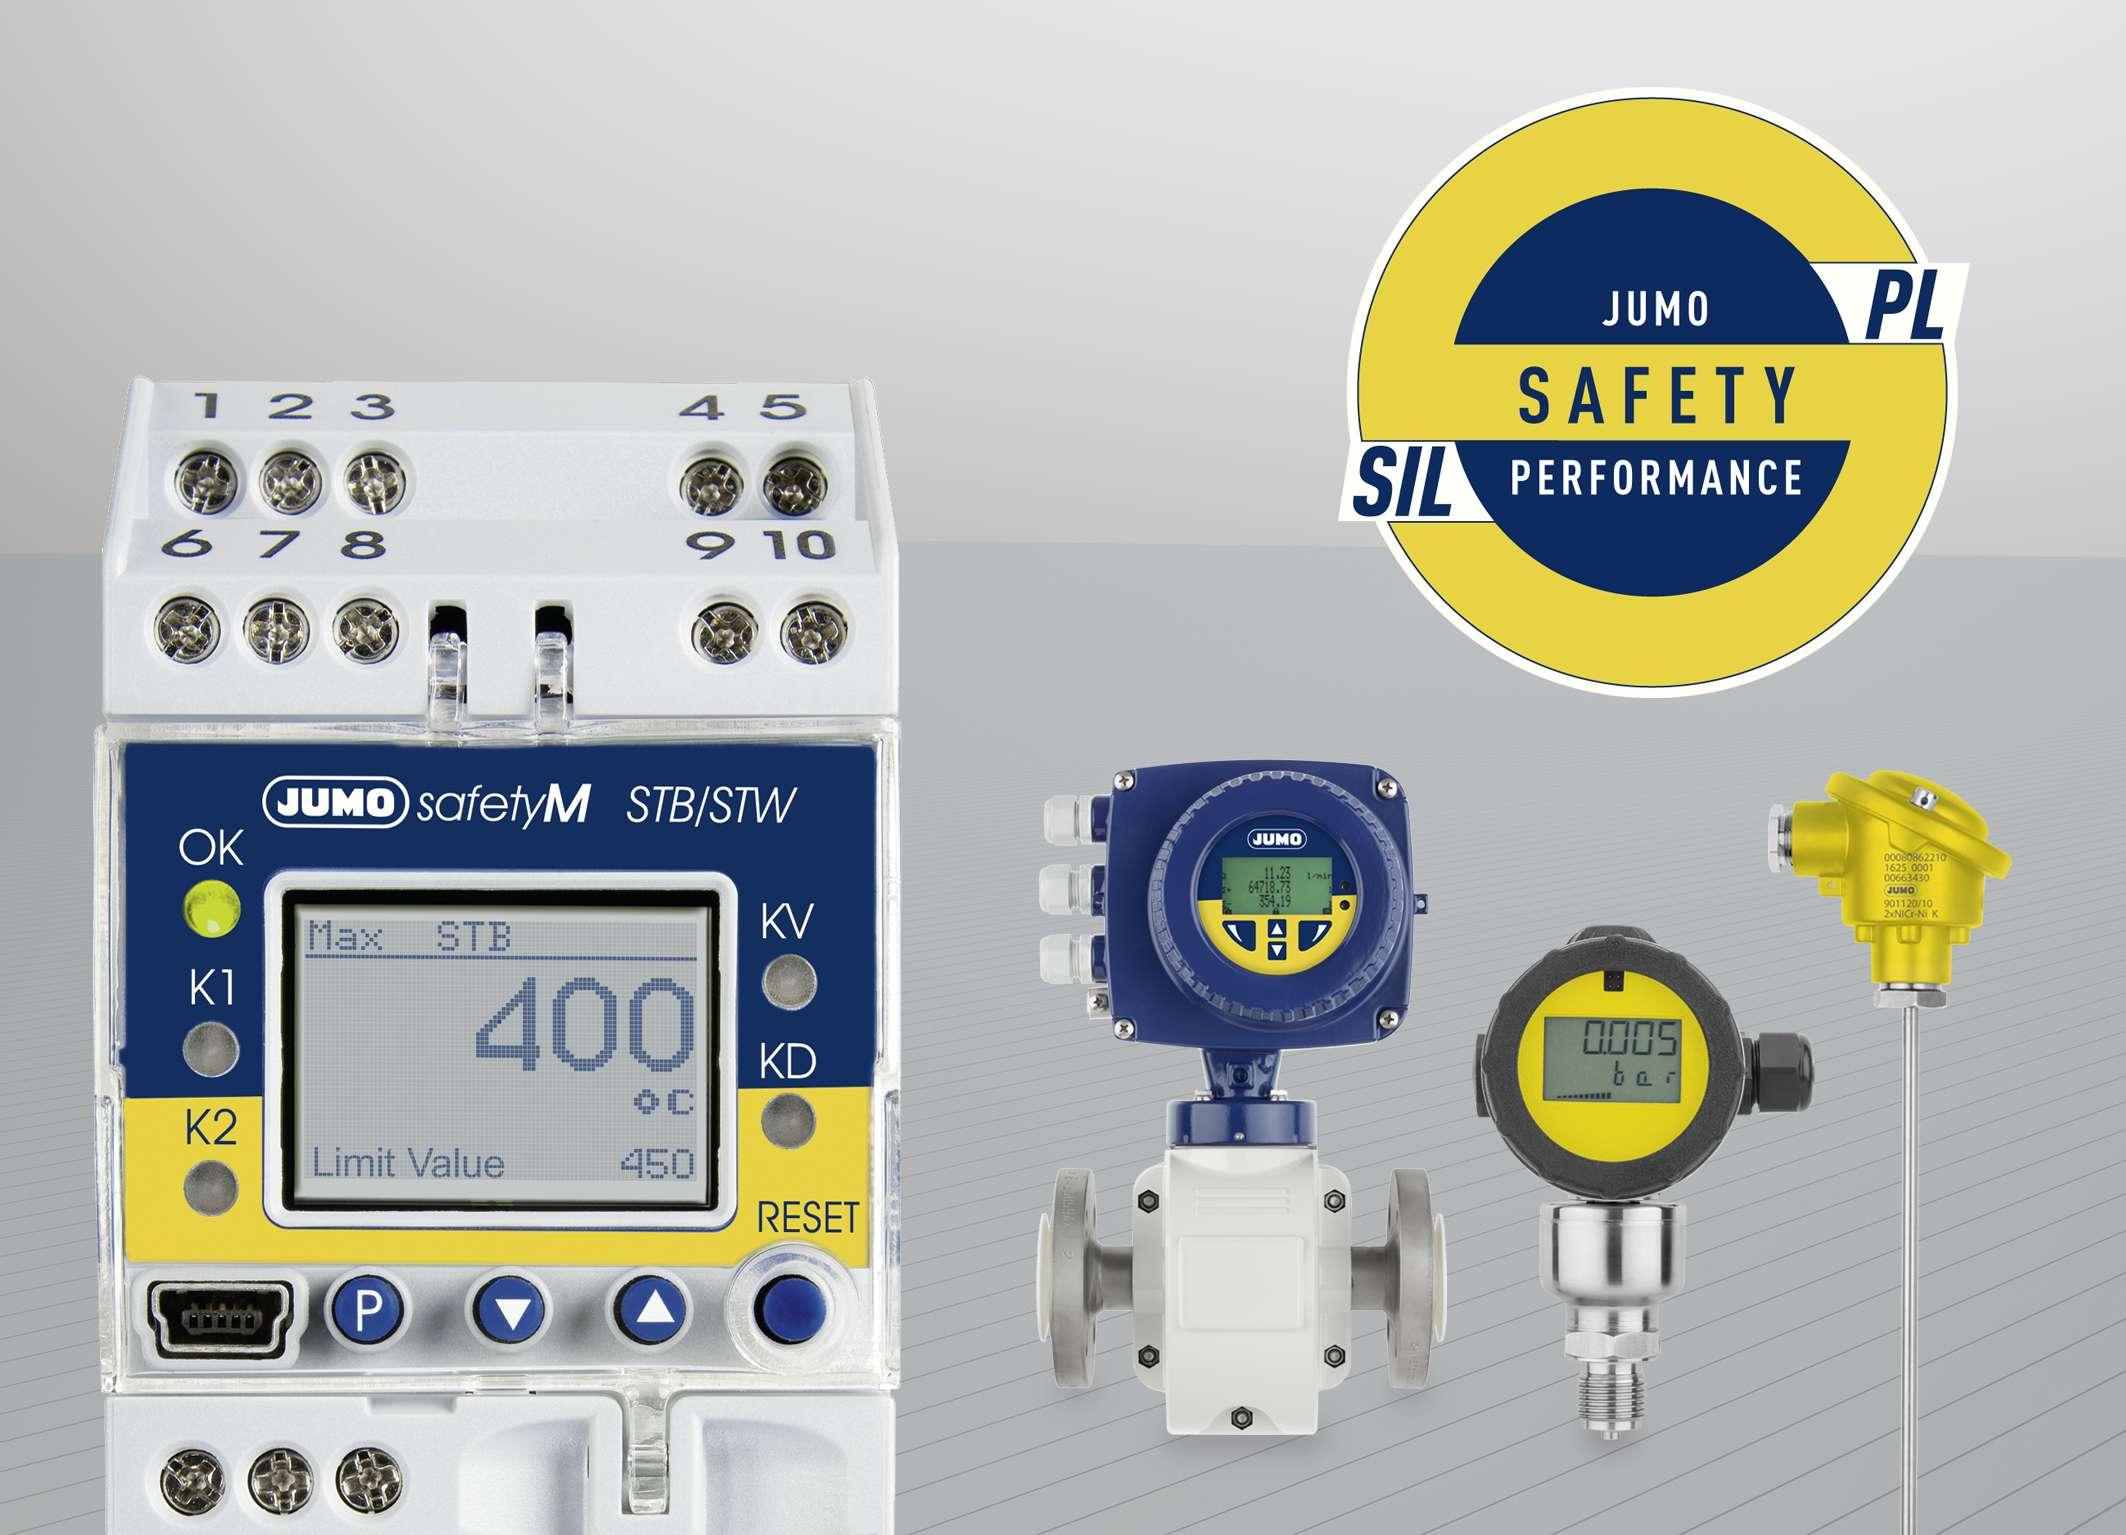 JUMO Safety Performance Pressefoto